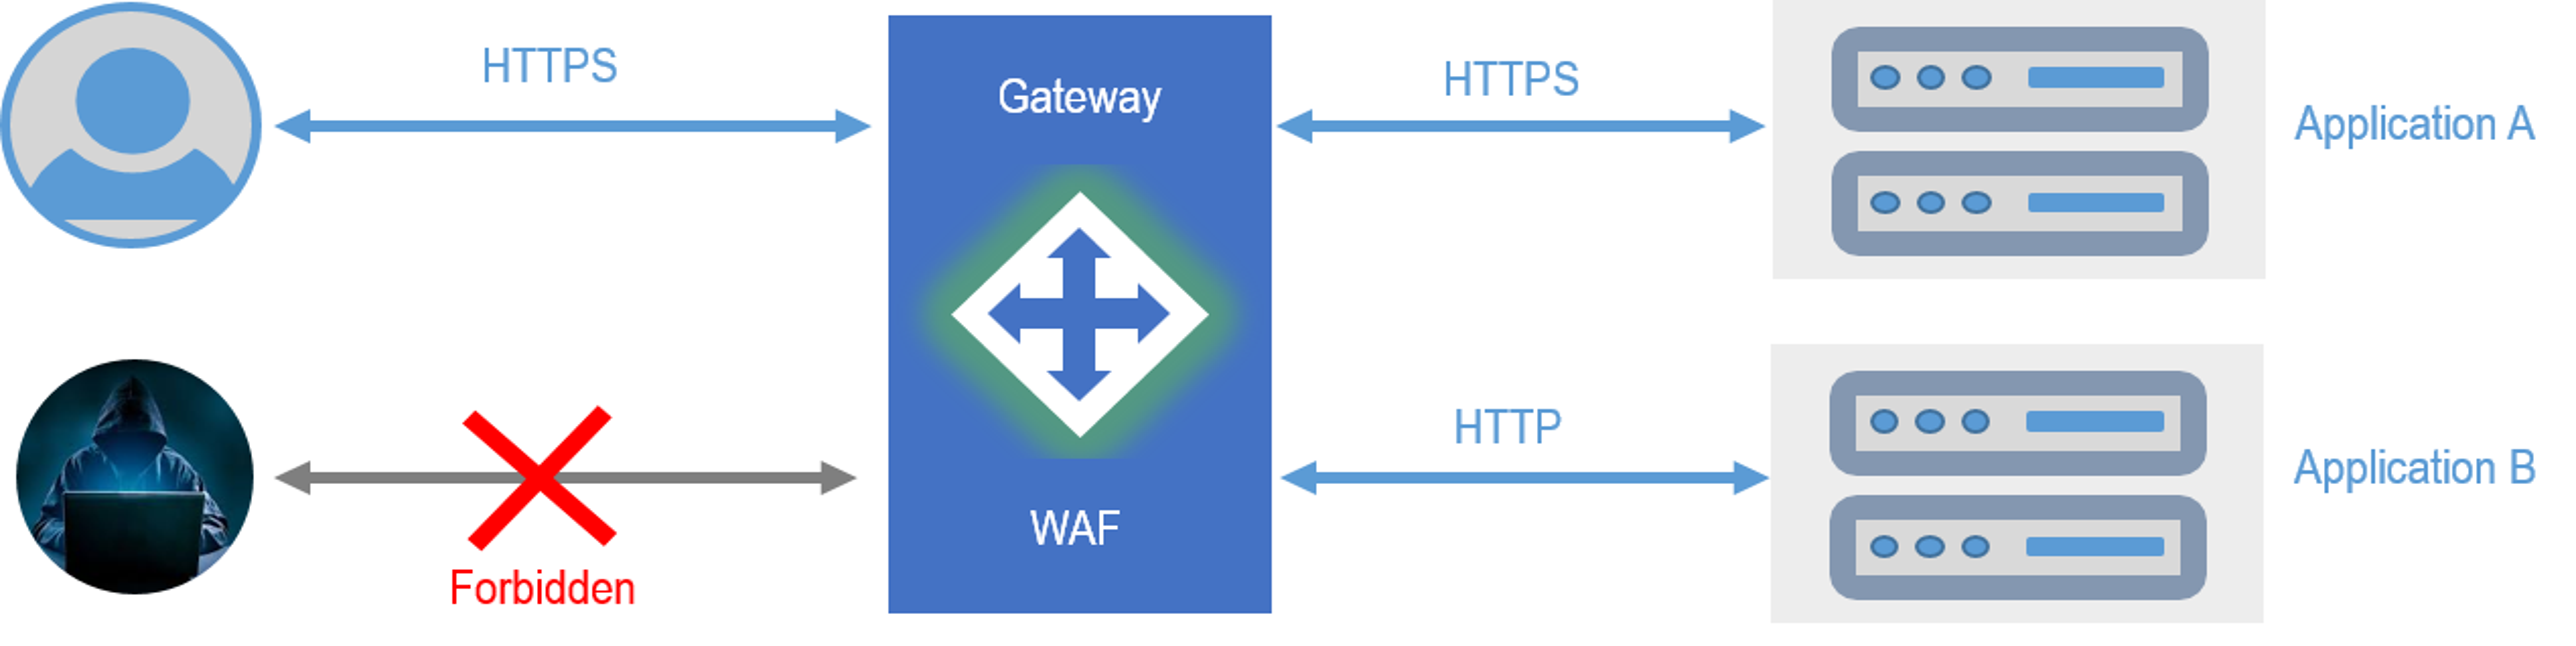 Janusec Application Gateway